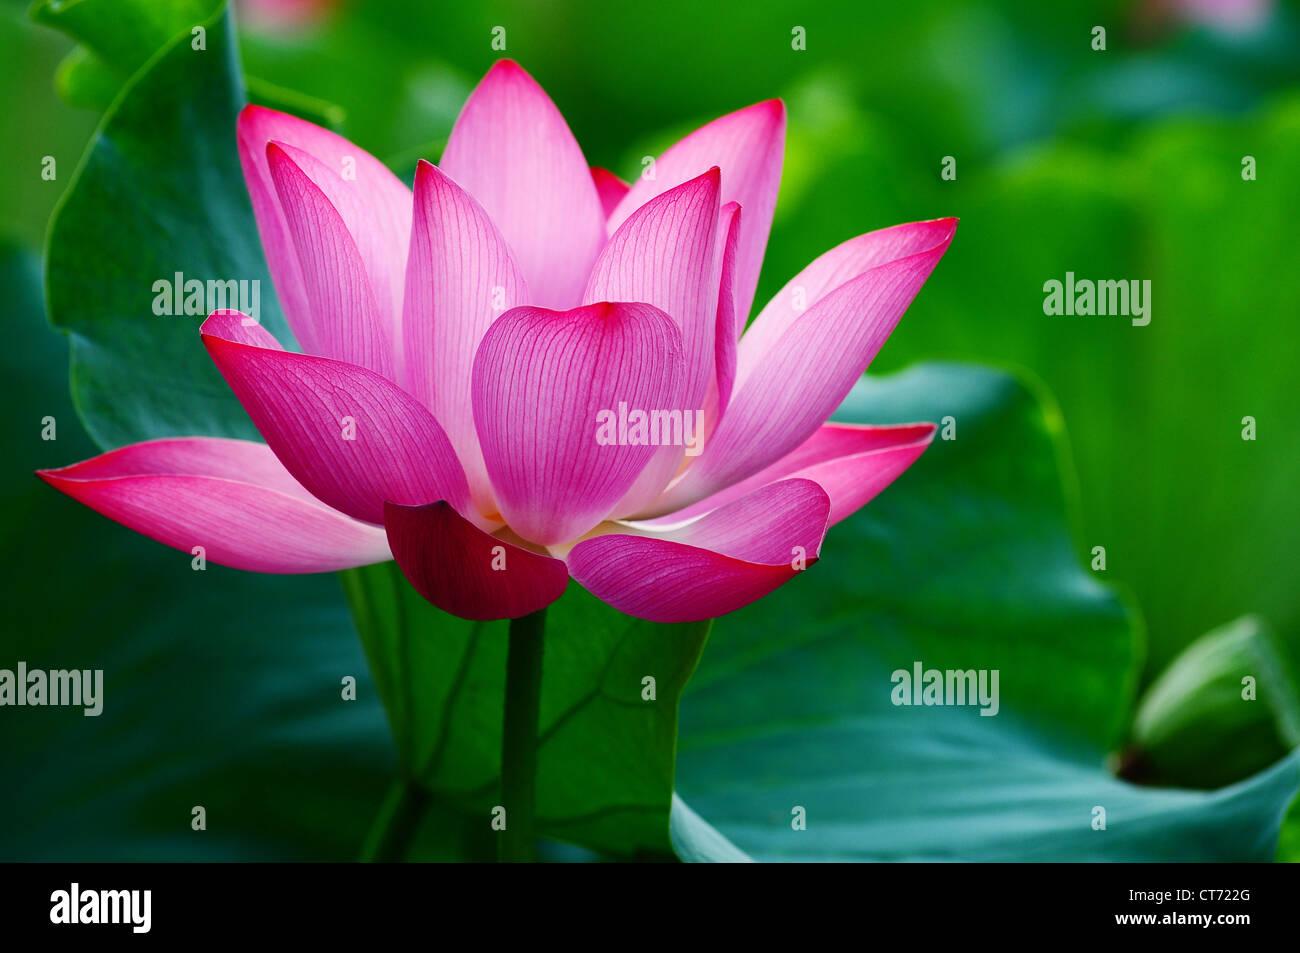 Wild bloom lotus flower stock photos wild bloom lotus flower stock blooming lotus flower in a pond in the summer sunlight stock image izmirmasajfo